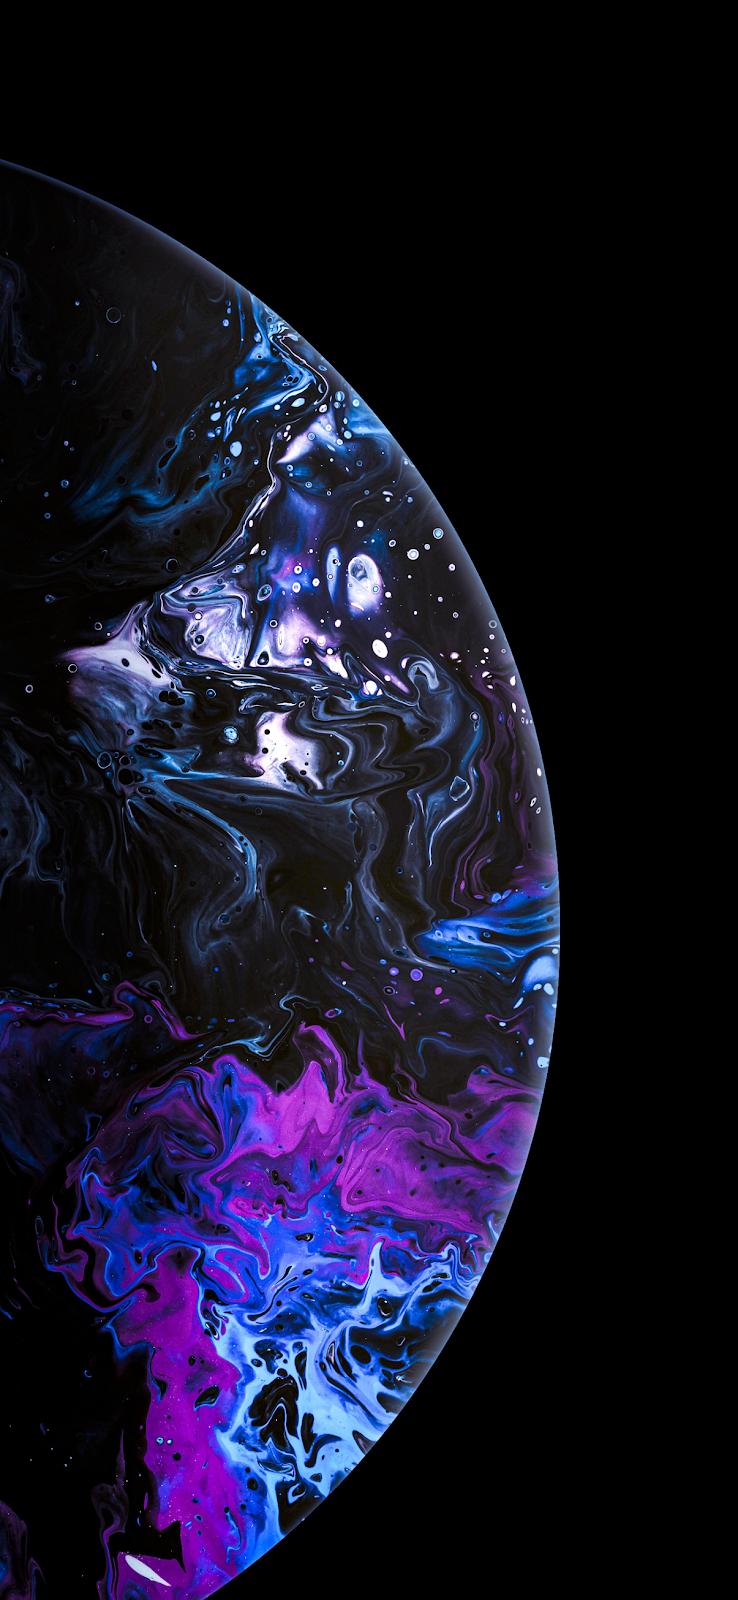 Purplish Bubble Cancer